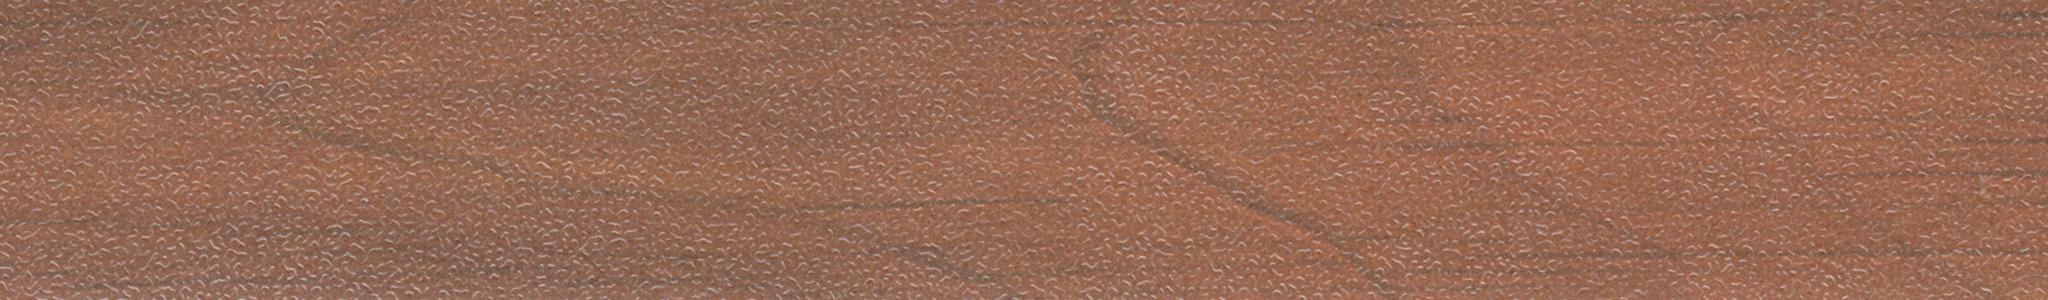 HD 421625 lamino hrana calvados tmavý perla